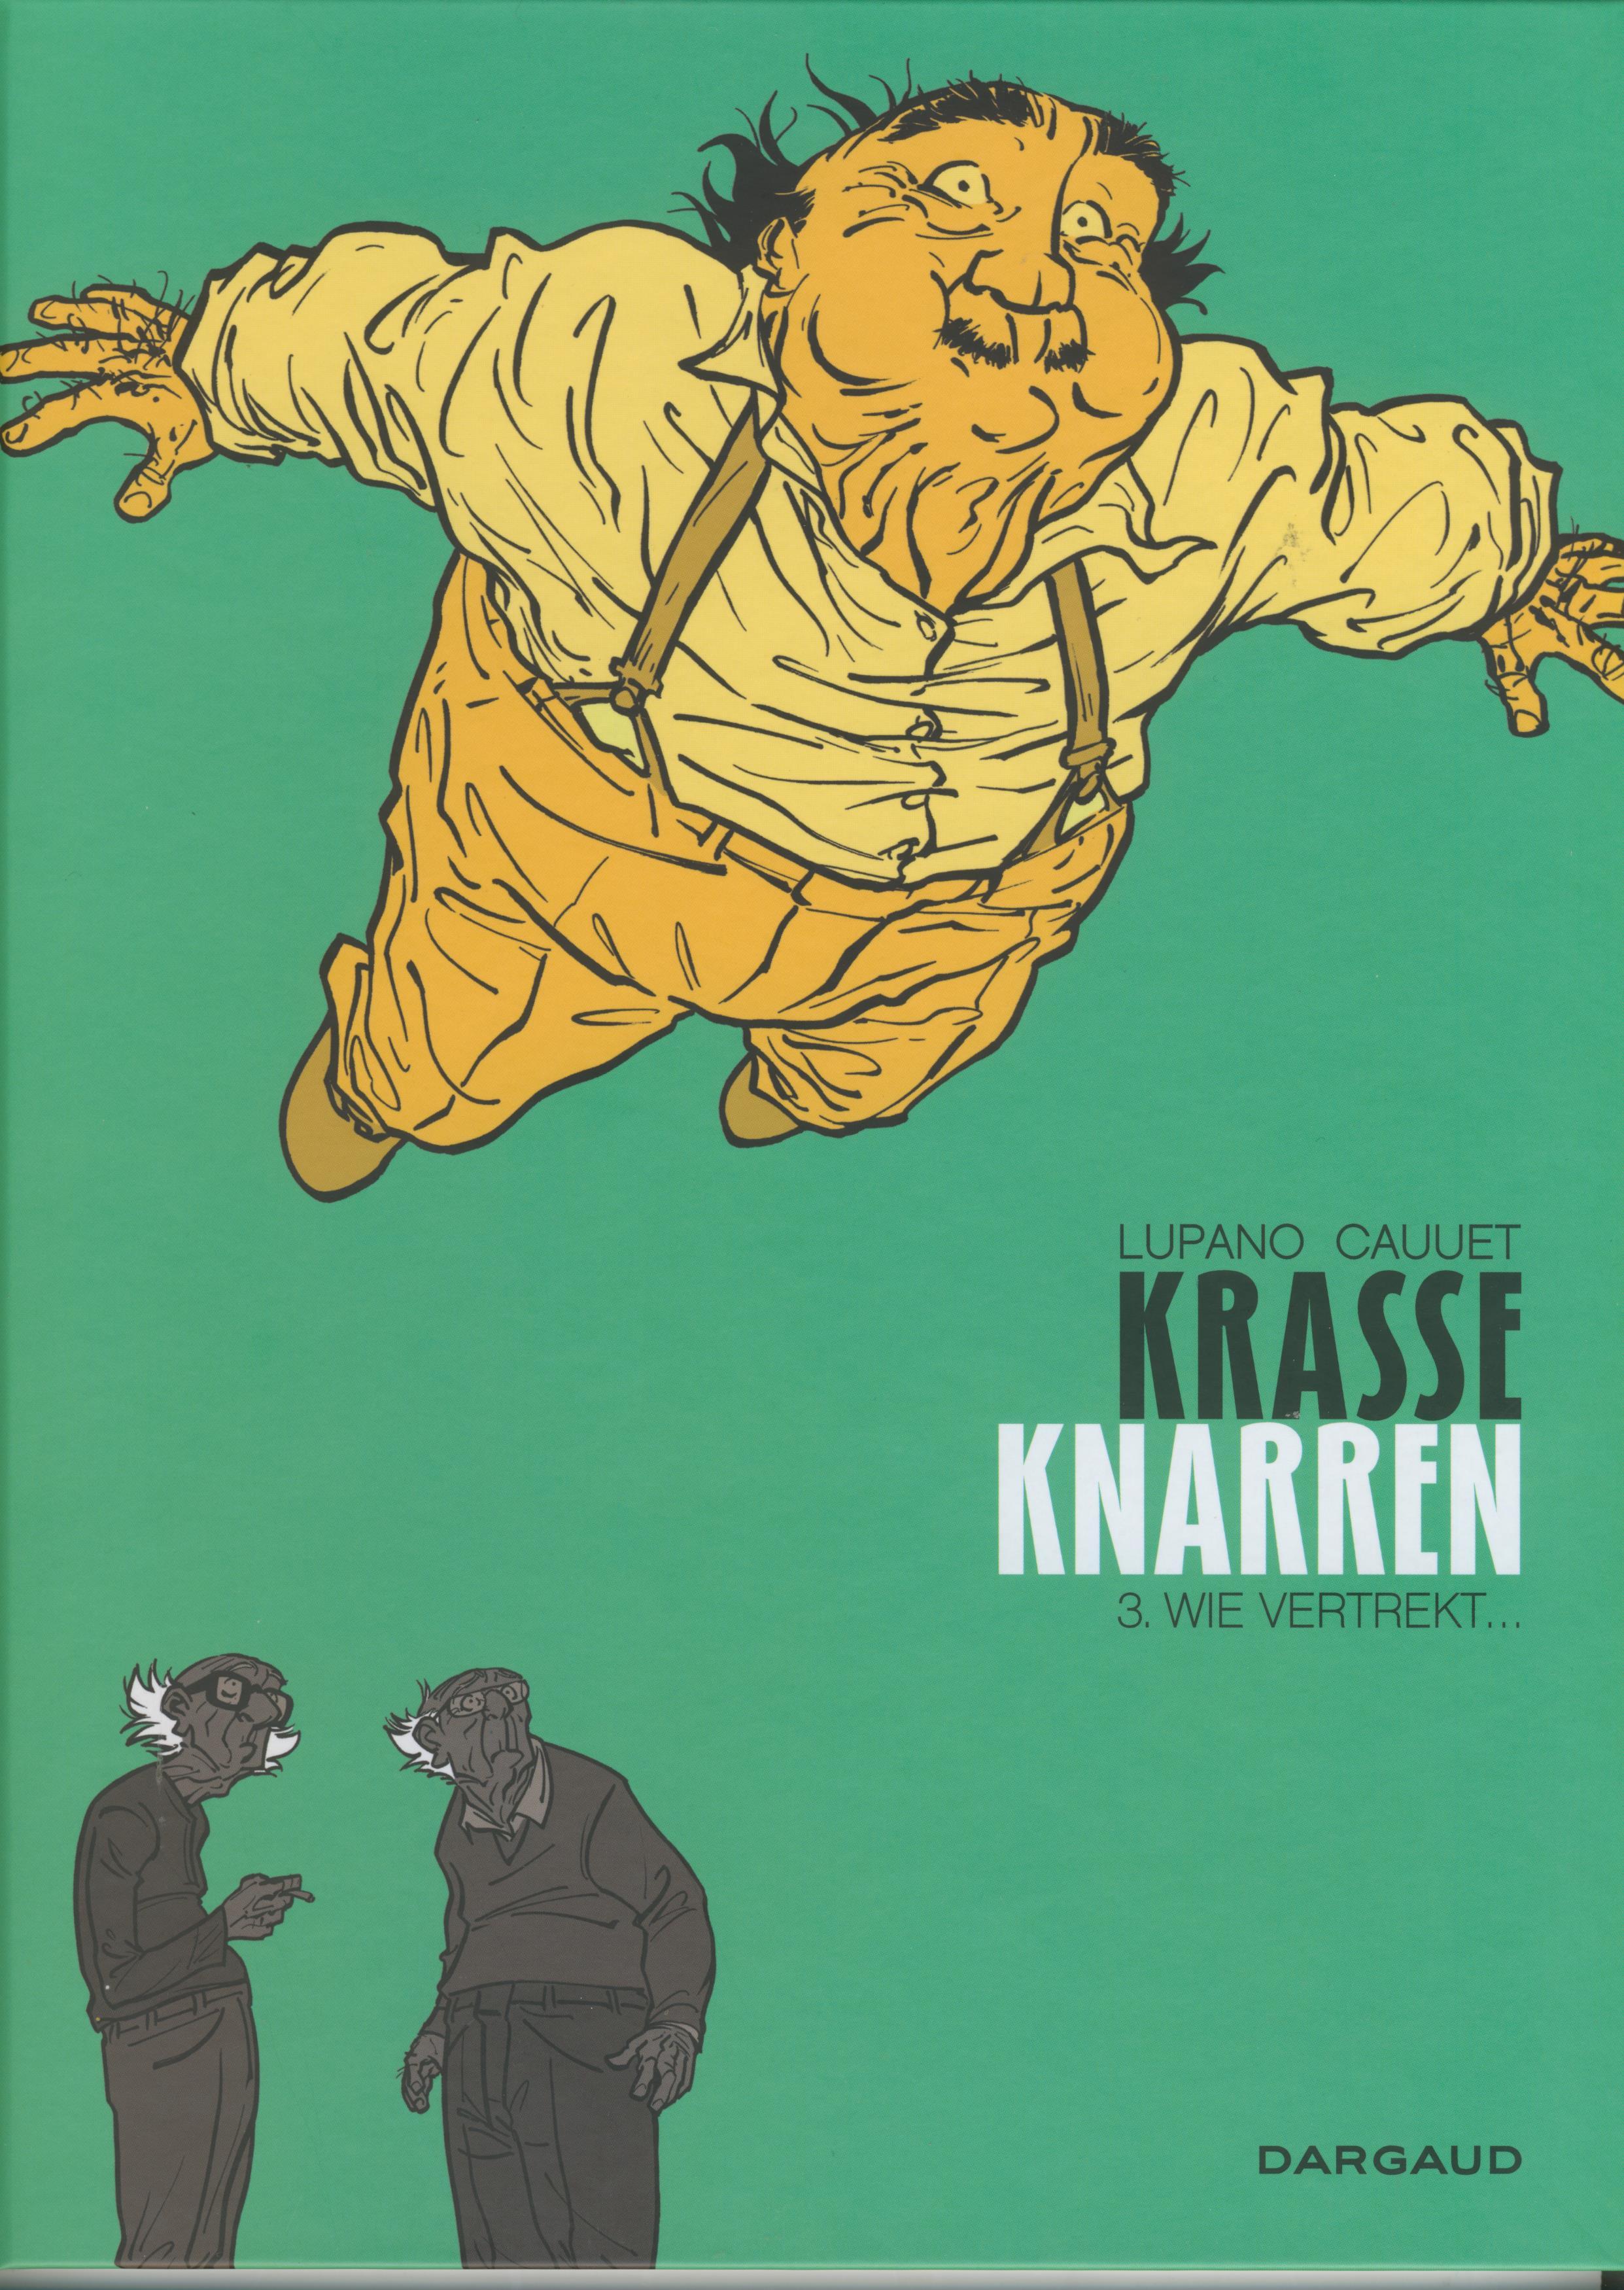 Krasse Knarren 3, Lupano, Cauuet, wie vertrekt, dargaud, strip, drie, 3, stripboeken, stripverhaal, stripboek, stripspeciaalzaak, nieuwe strips